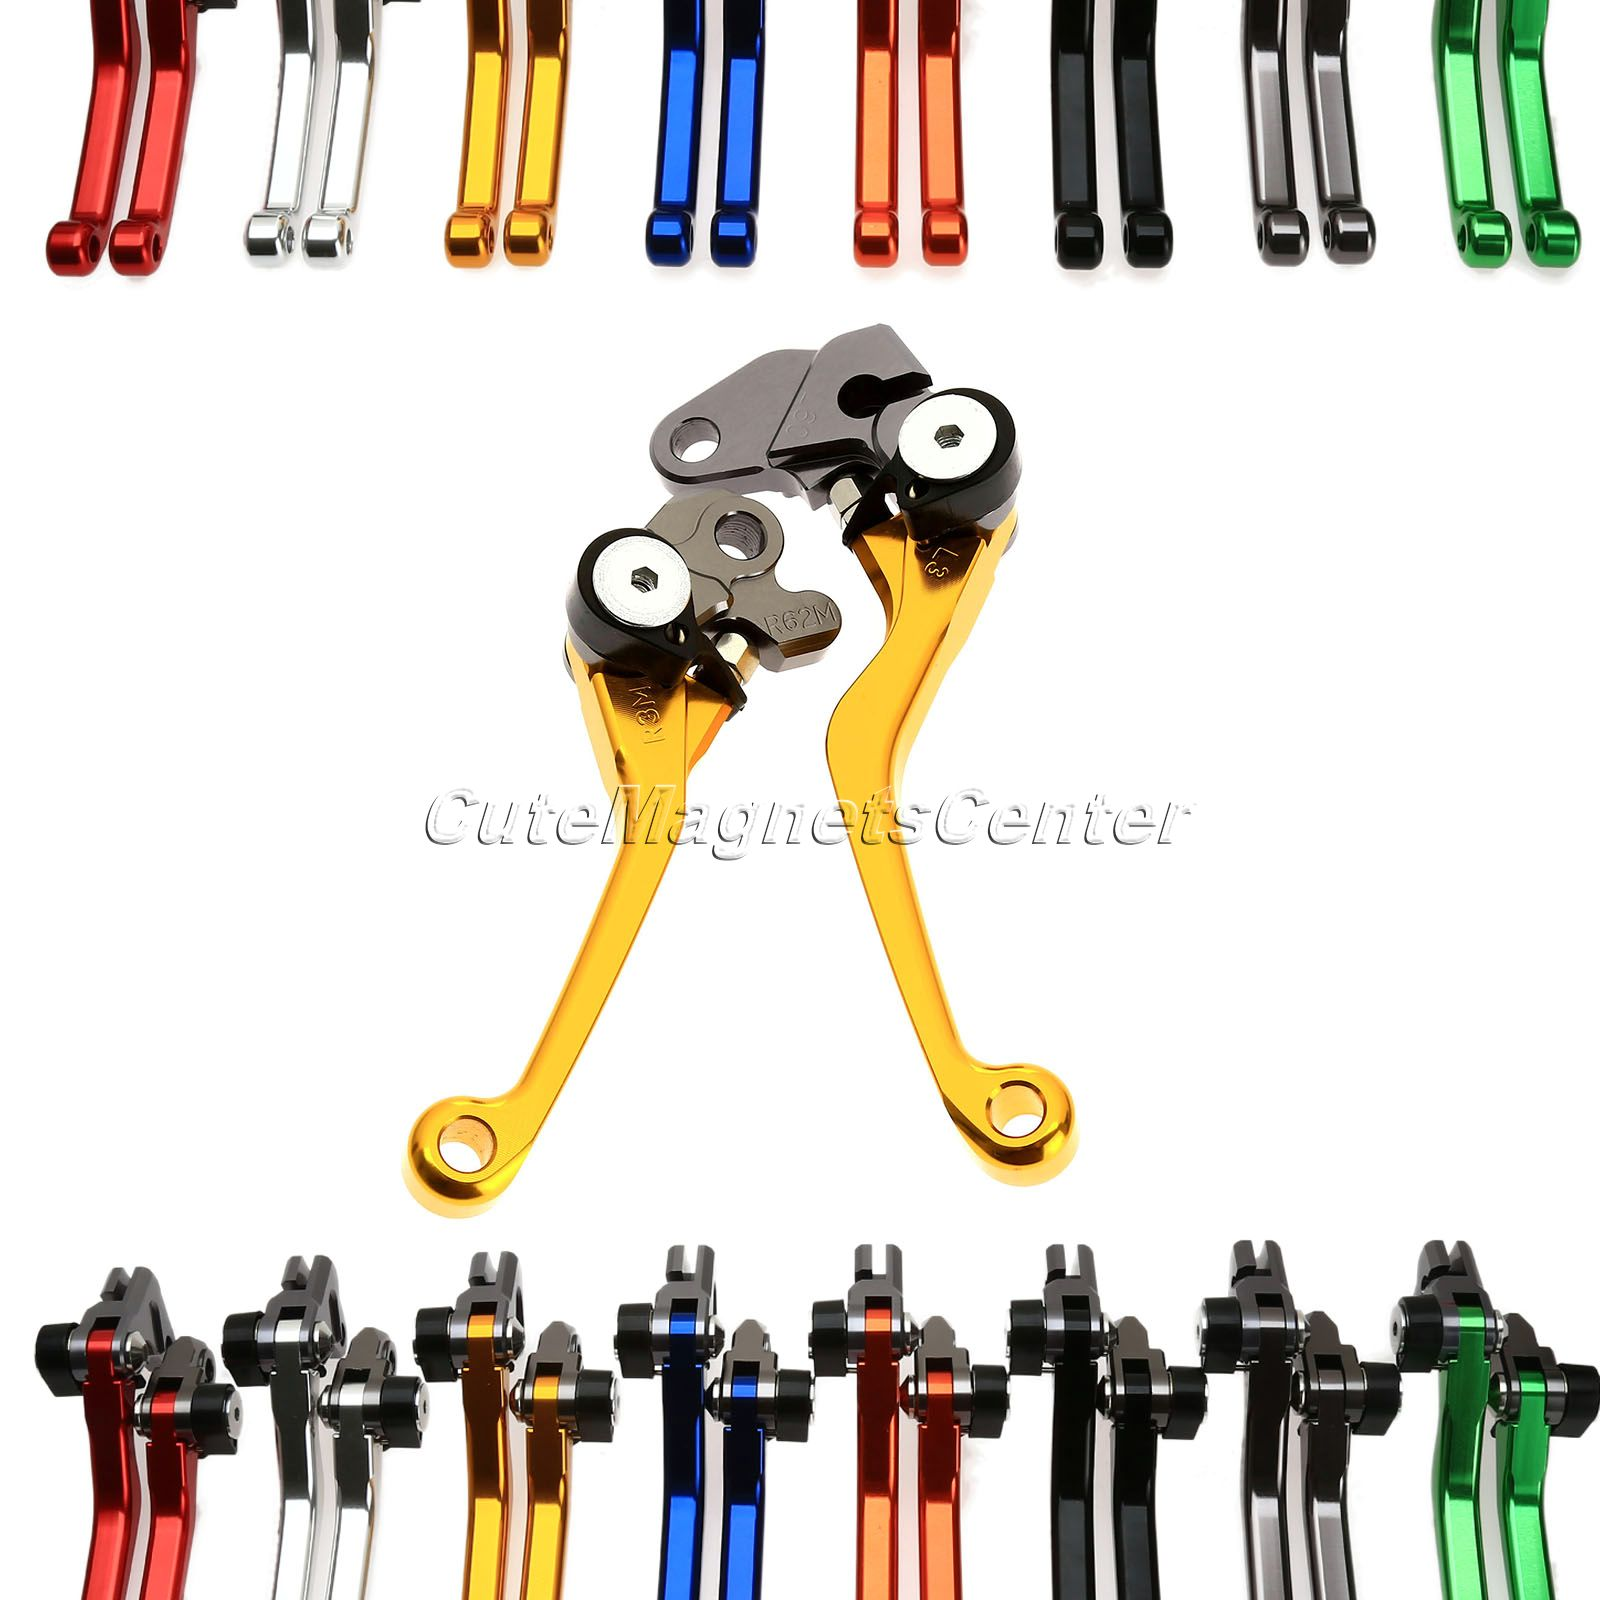 CNC Pivot Dirt Bike Adjustable Clutch Brake Levers for Honda XR250 / MOTARD 1995-07 XR400 / MOTARD 2005-08 CRM250R / AR 1994-99 cnc dirt bike flex pivot brake clutch levers for honda crm250r ar xr250 400 motard